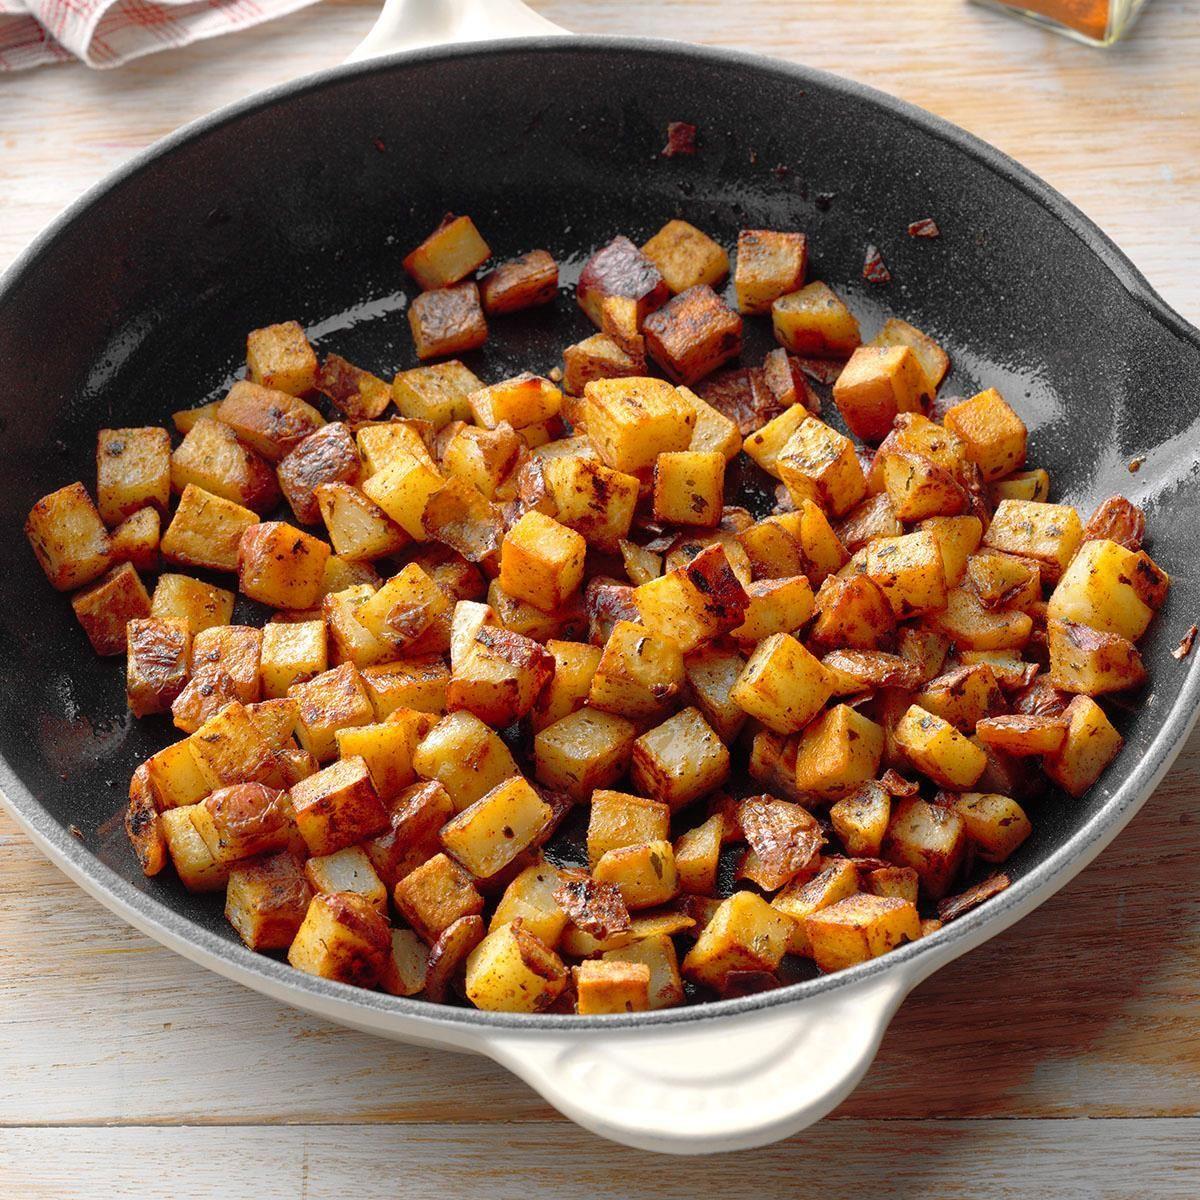 Skillet Red Potatoes Recipe In 2020 Red Potato Recipes Potato Recipes Red Potatoes